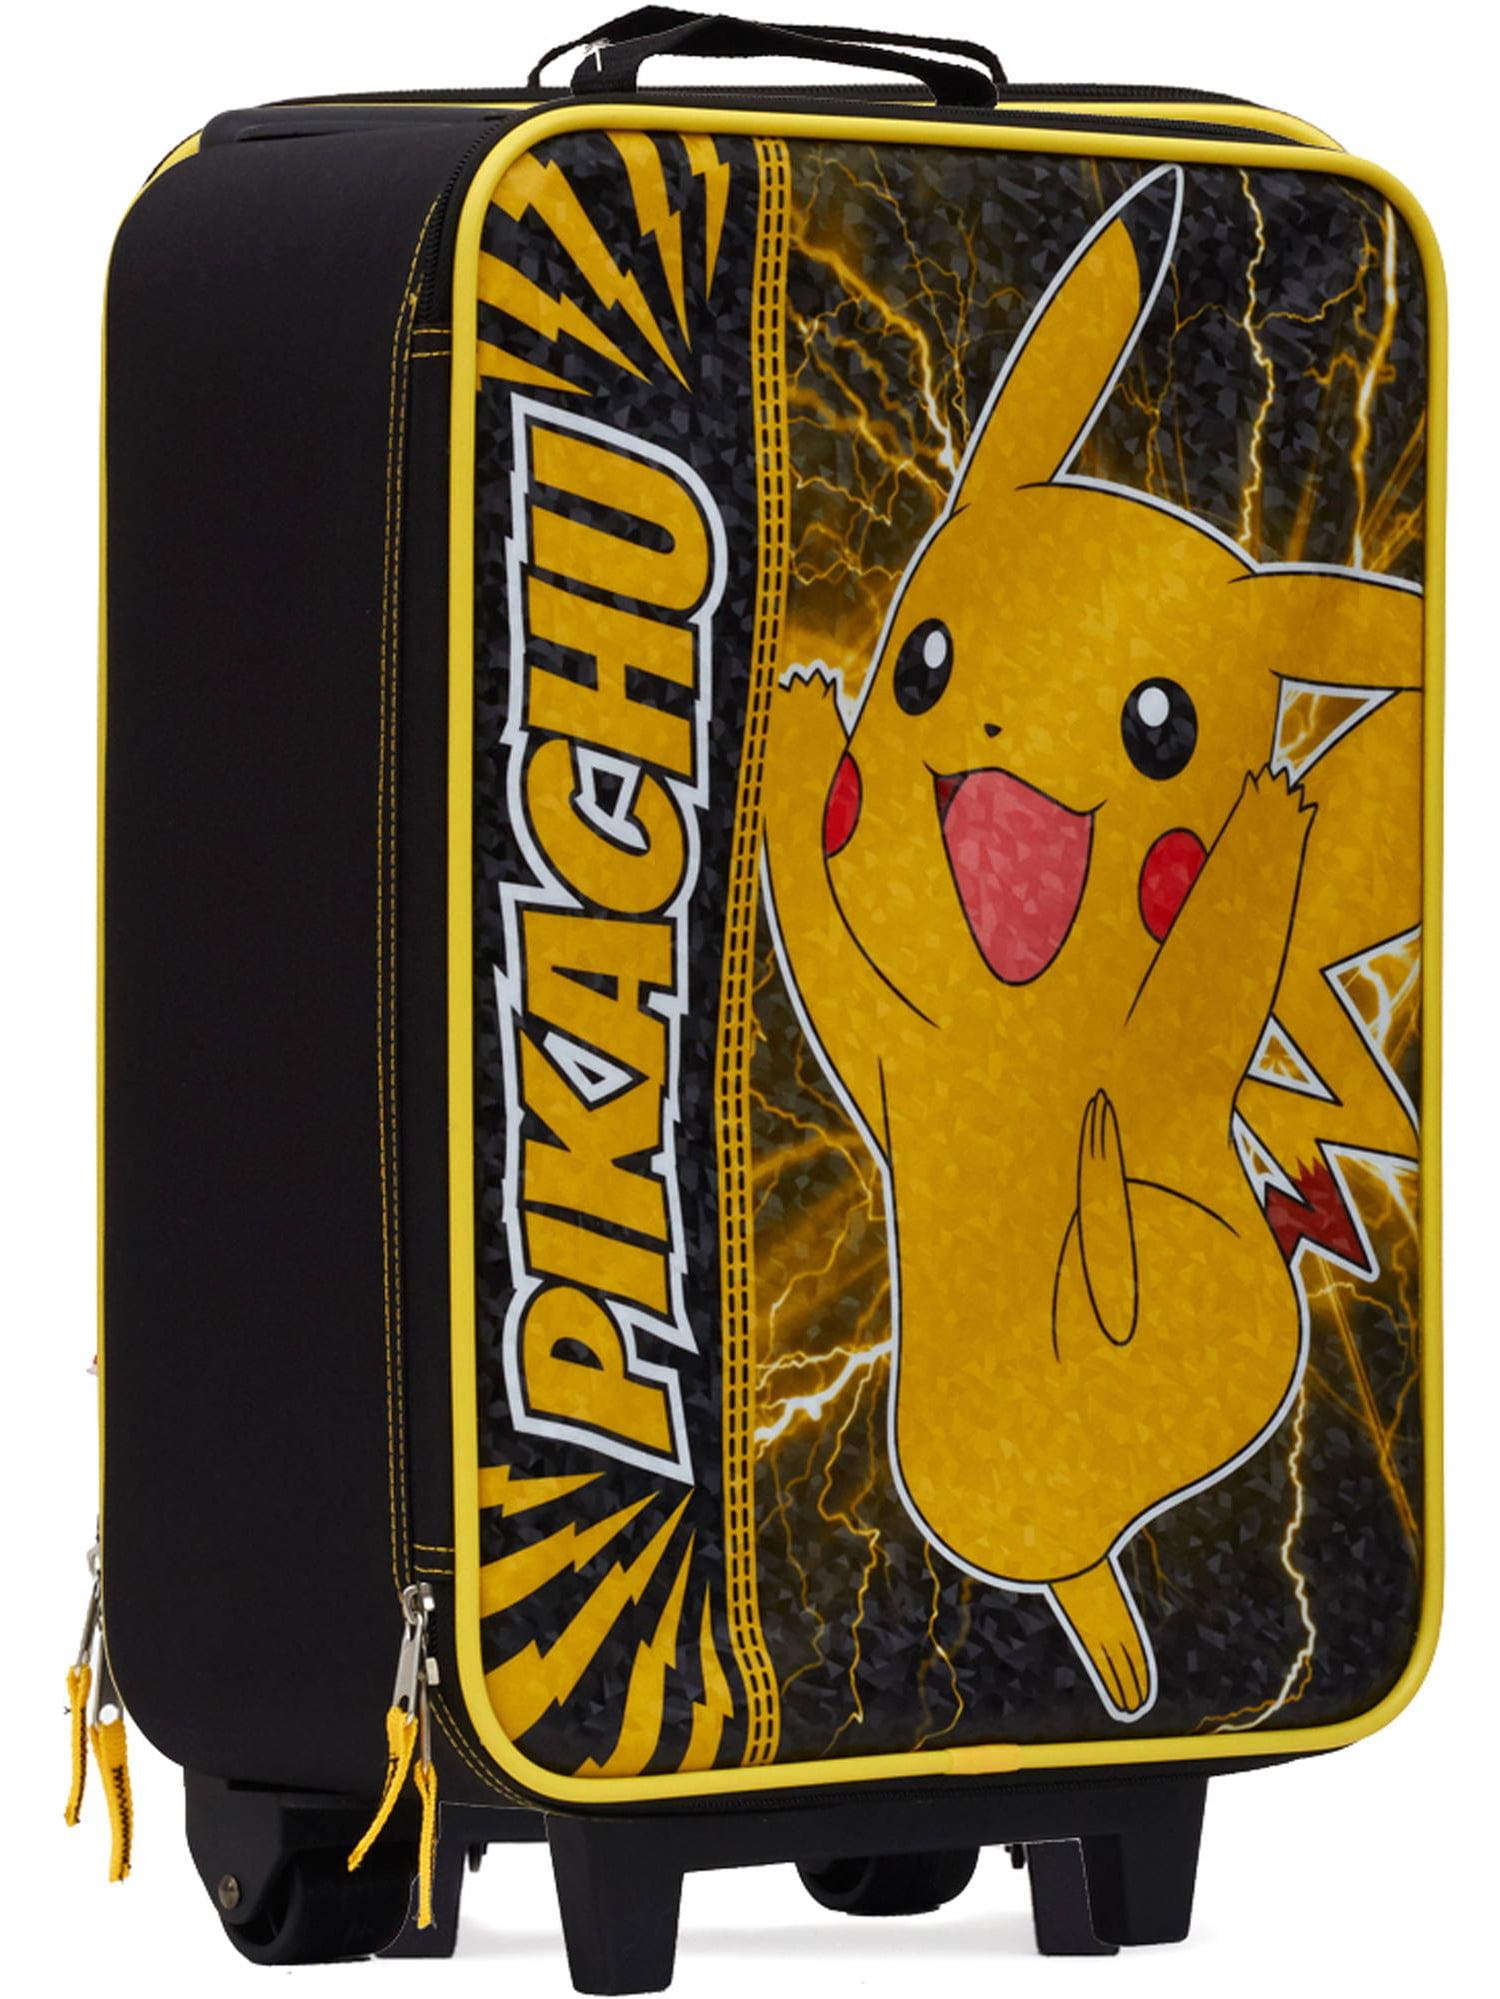 New Arrive Pokemon House Party Blue Pokeball Pilot Case//Luggage